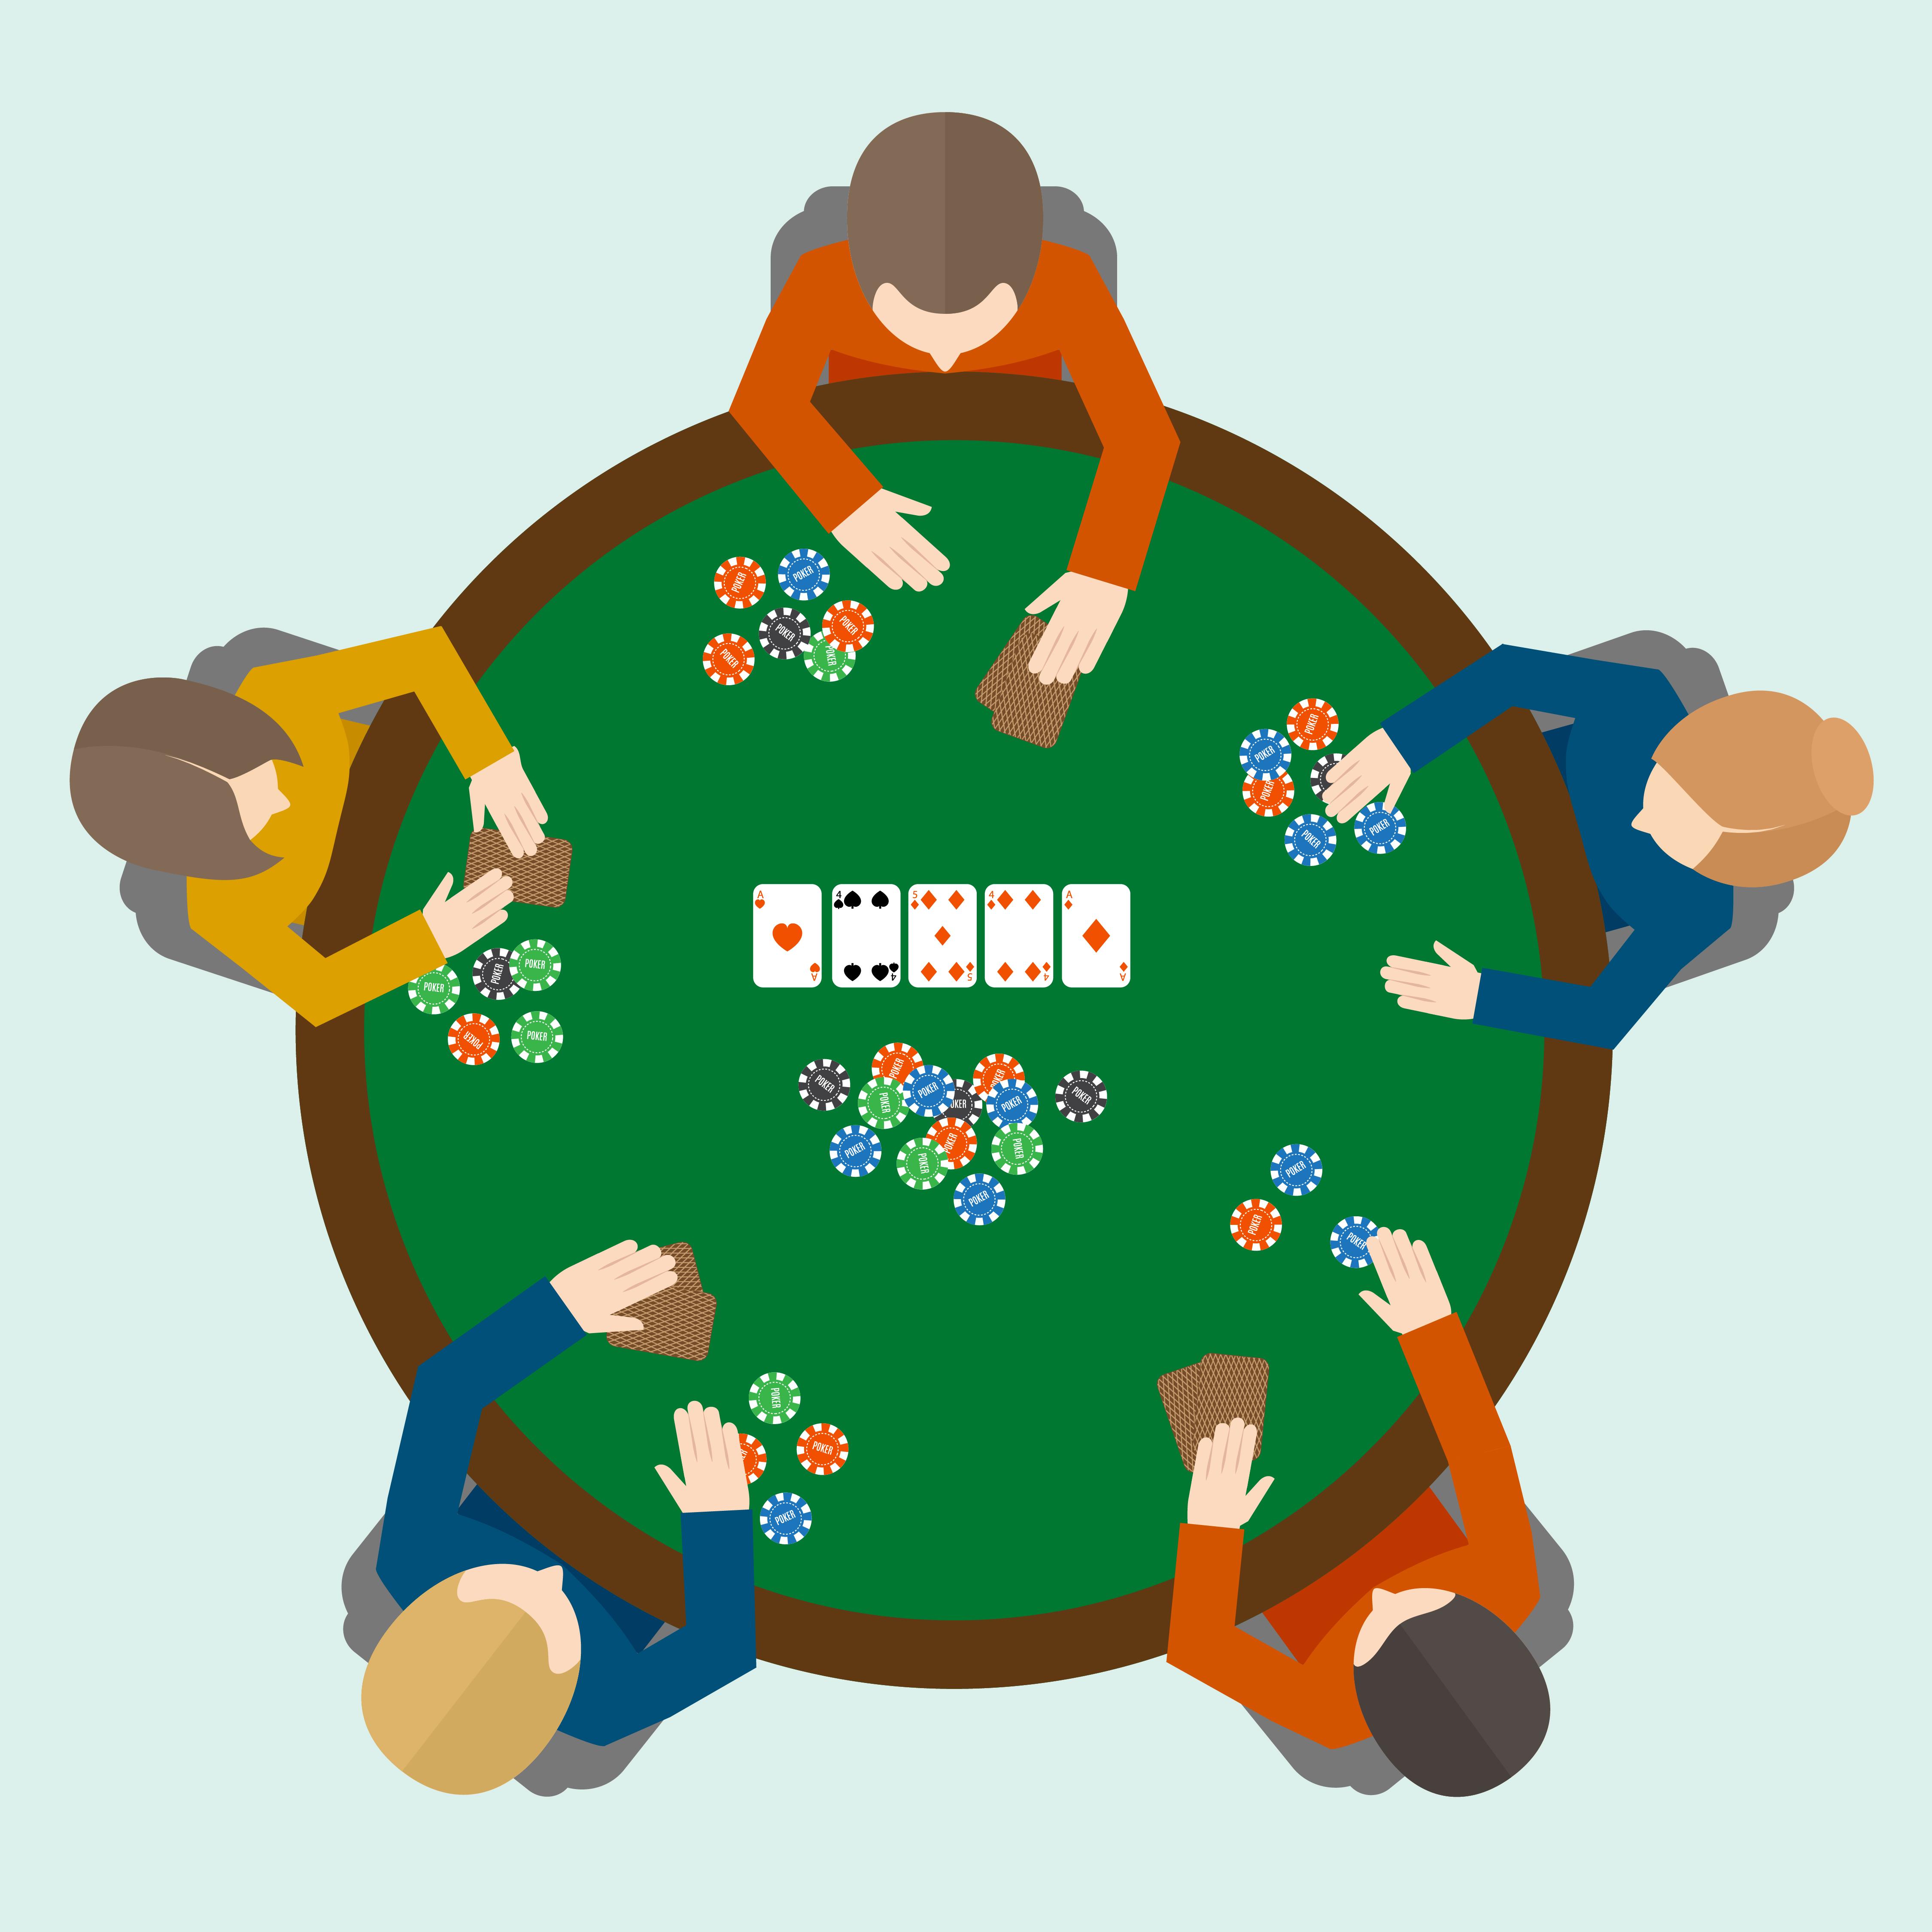 Casino slot spiele kostenlos yg ringtone